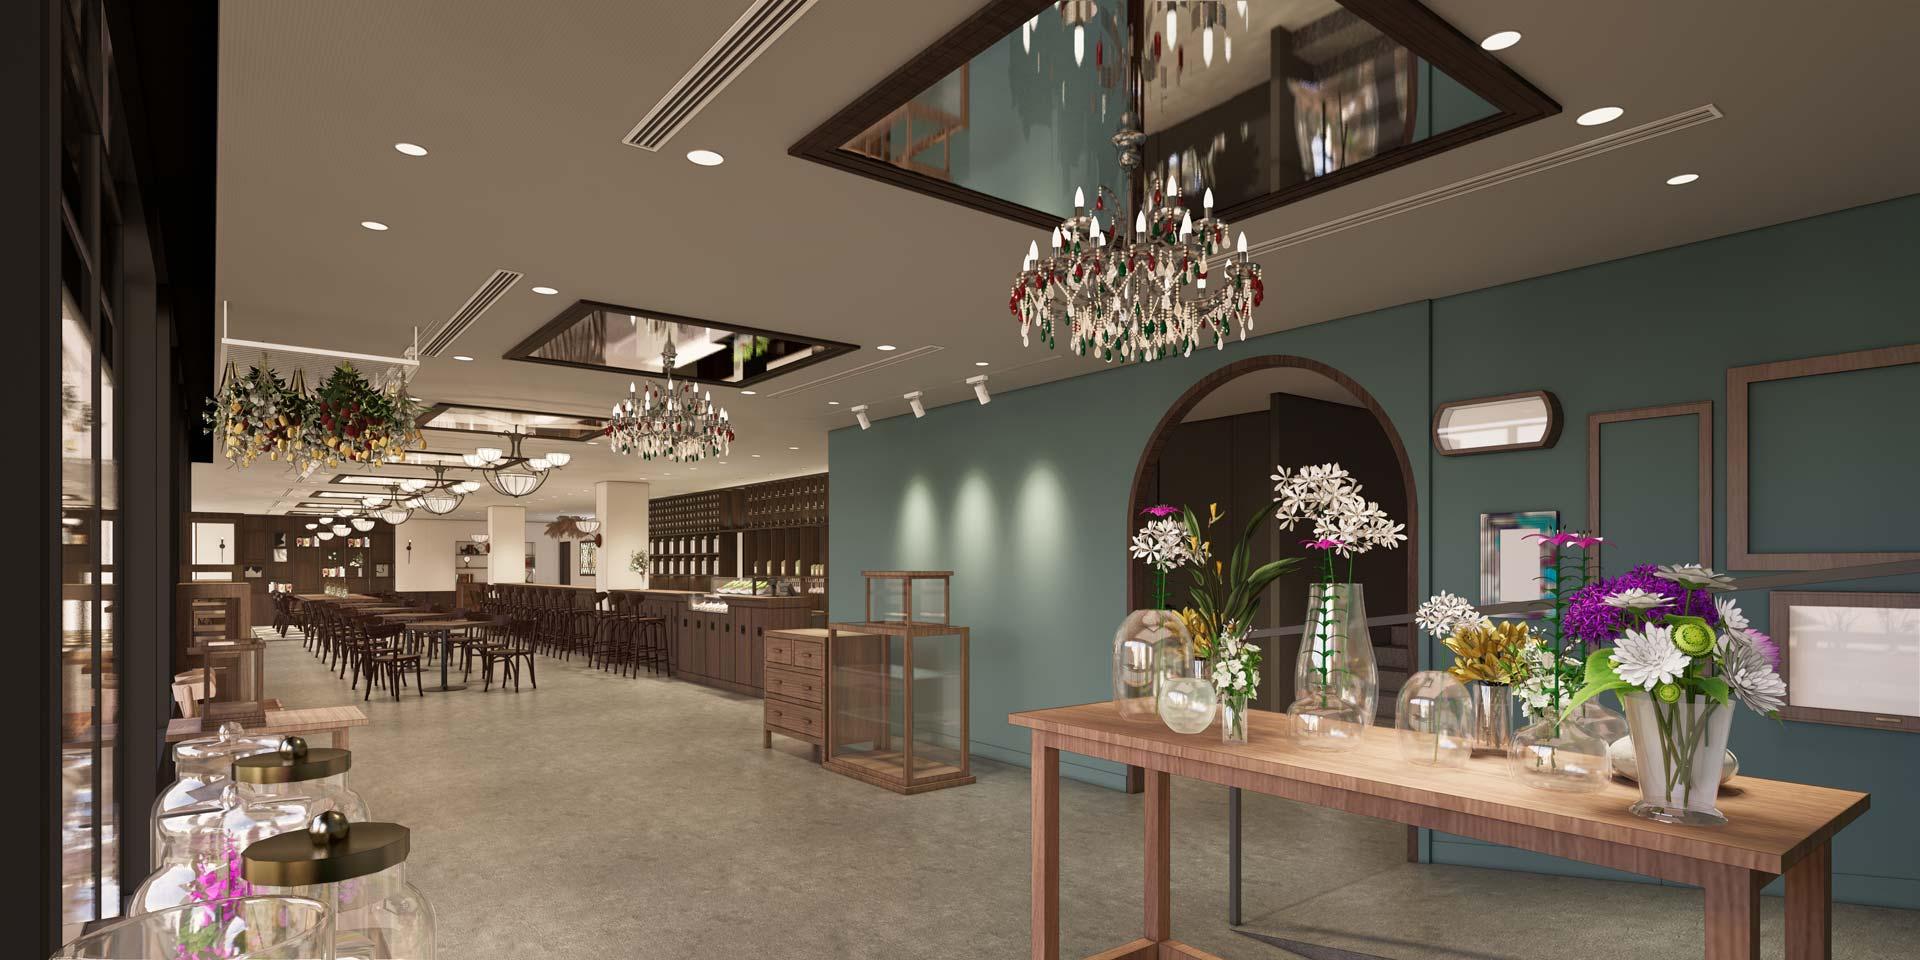 TOKYO FANTASTIC ボタニカル店と茶珈堂 イメージパース